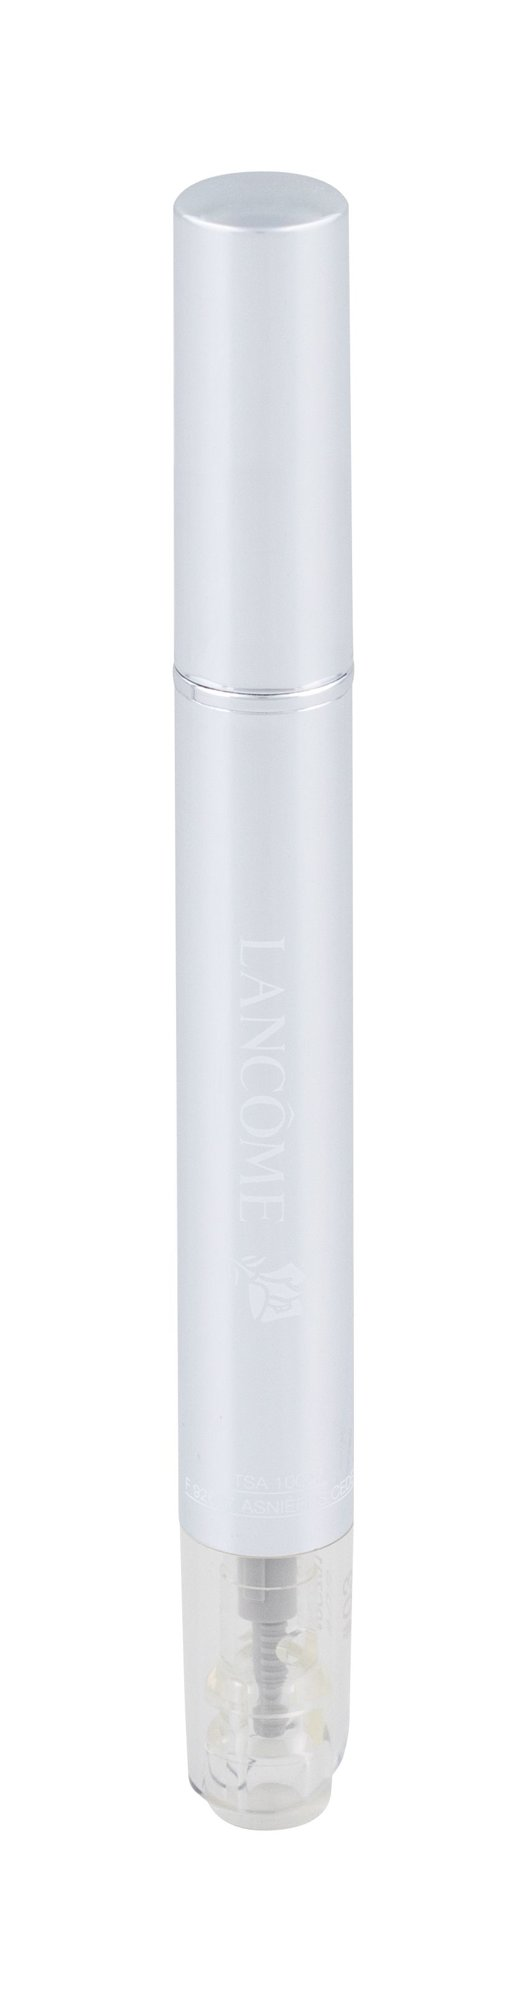 Lancôme Teint Miracle Cosmetic 2,5ml 03 Beige Lumiere